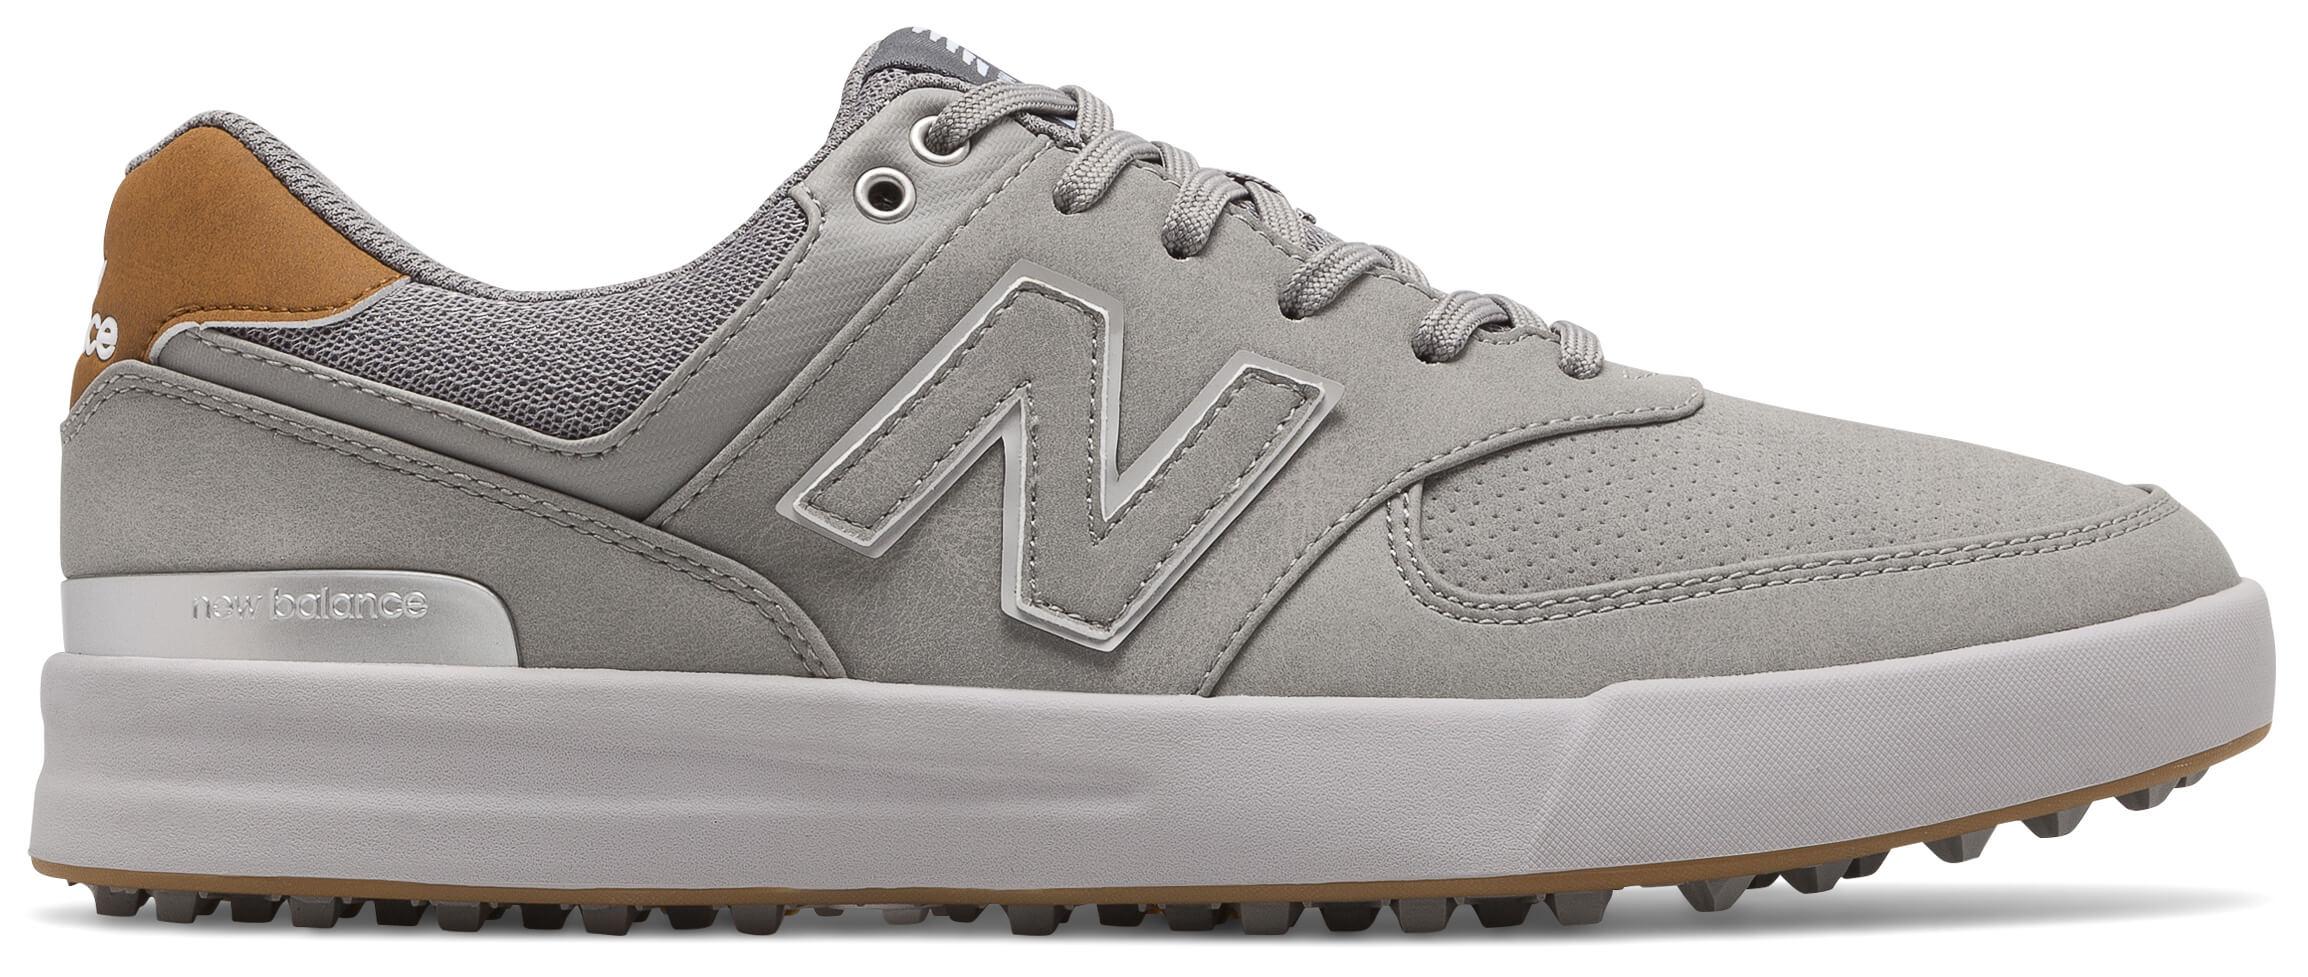 Details about New Balance 574 Greens Golf Shoes NBG574GGR Grey/Gum Men's  New - Choose Size!